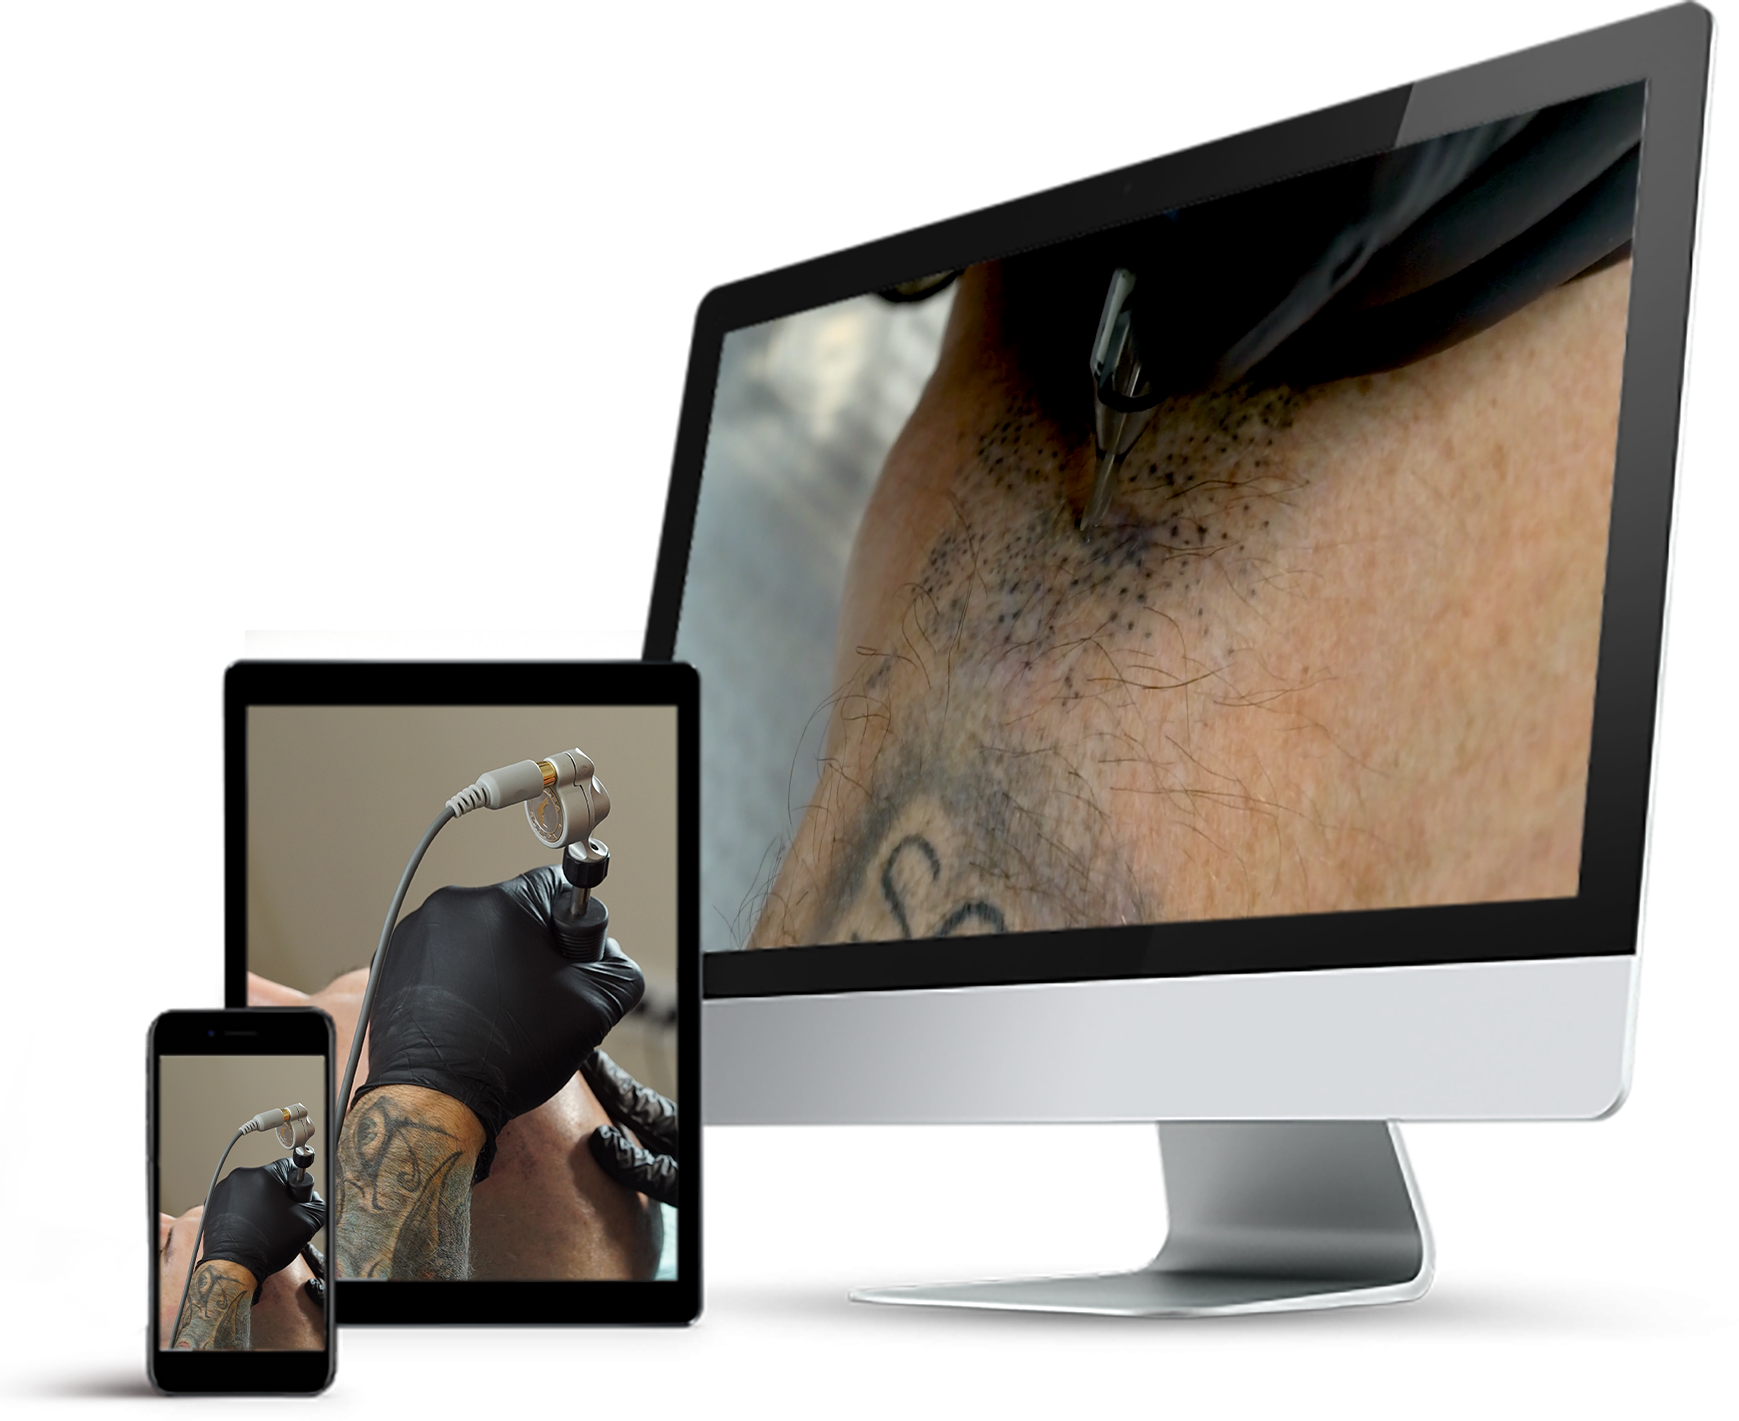 permanent makeup scalp micro pigmentation online training